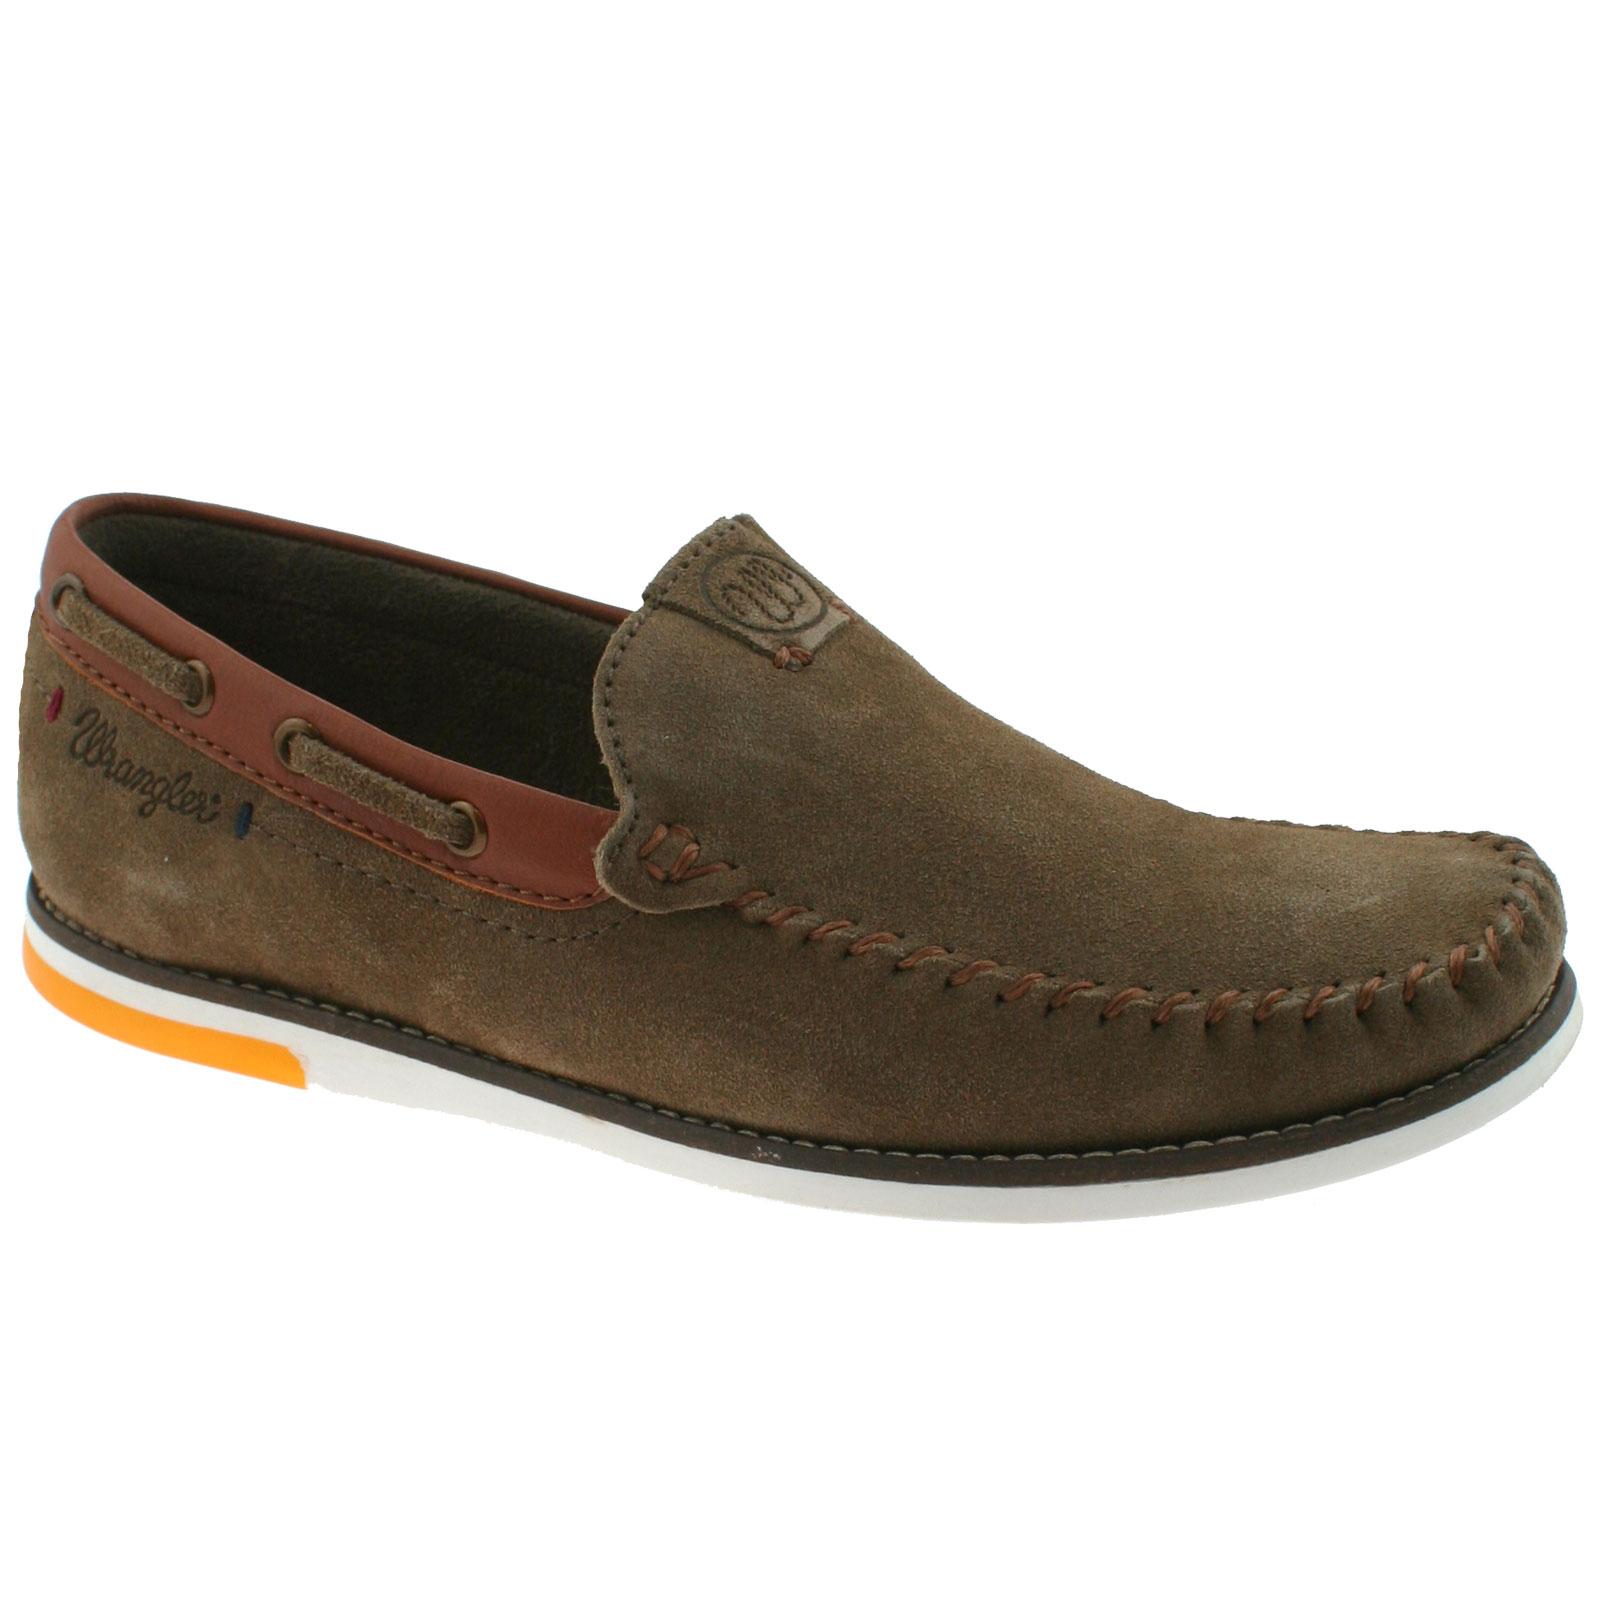 Wrangler Herren Foam Sharky Nubuk Leder Memory Foam Herren Slipper Halbschuhe Schuhe 163f7d